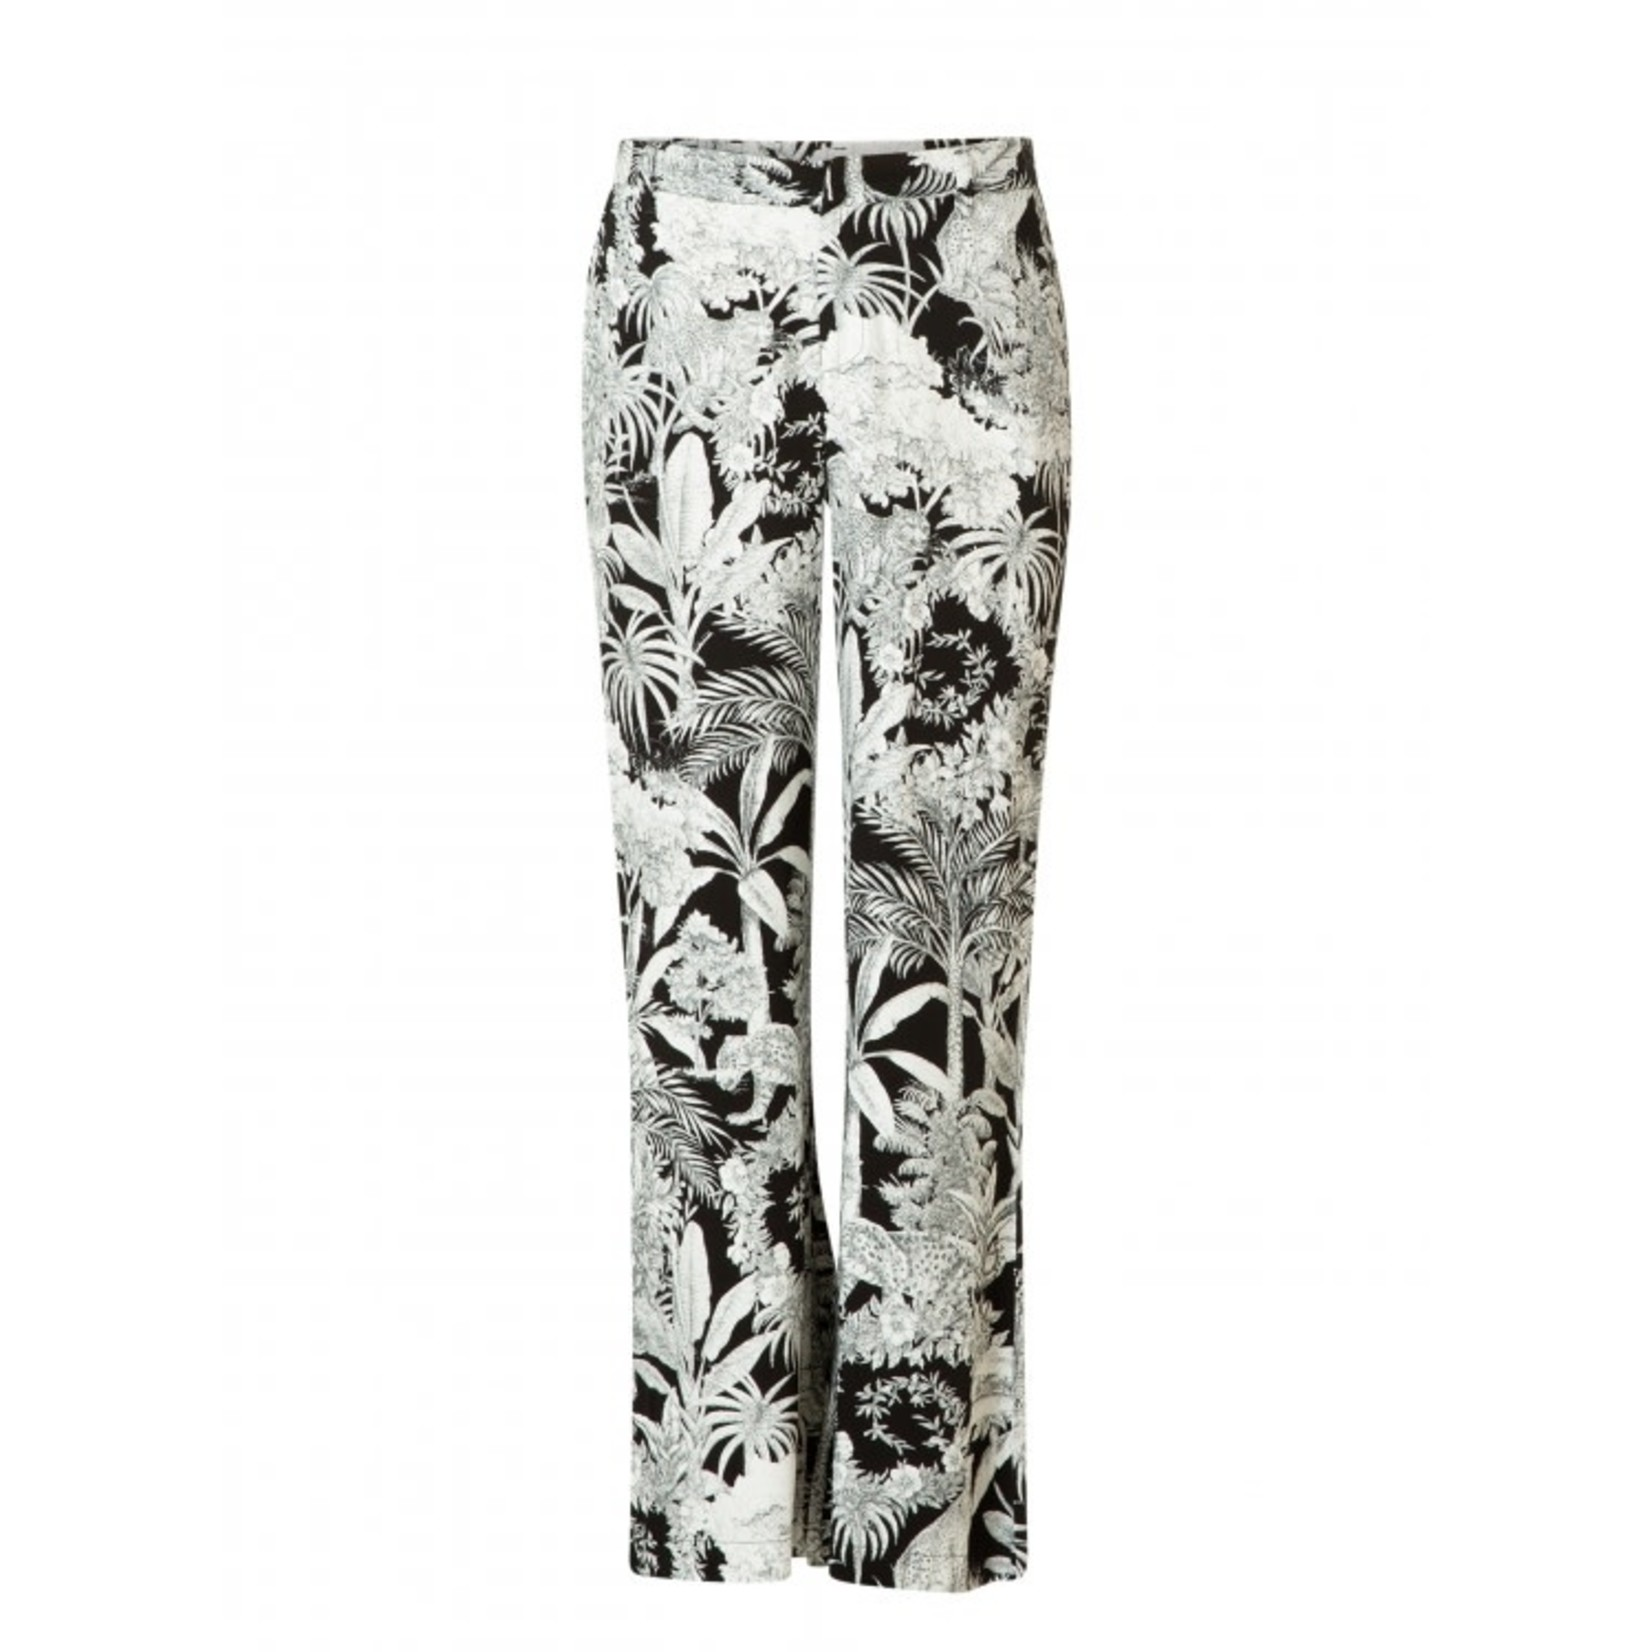 Yest Trousers Imani Black White